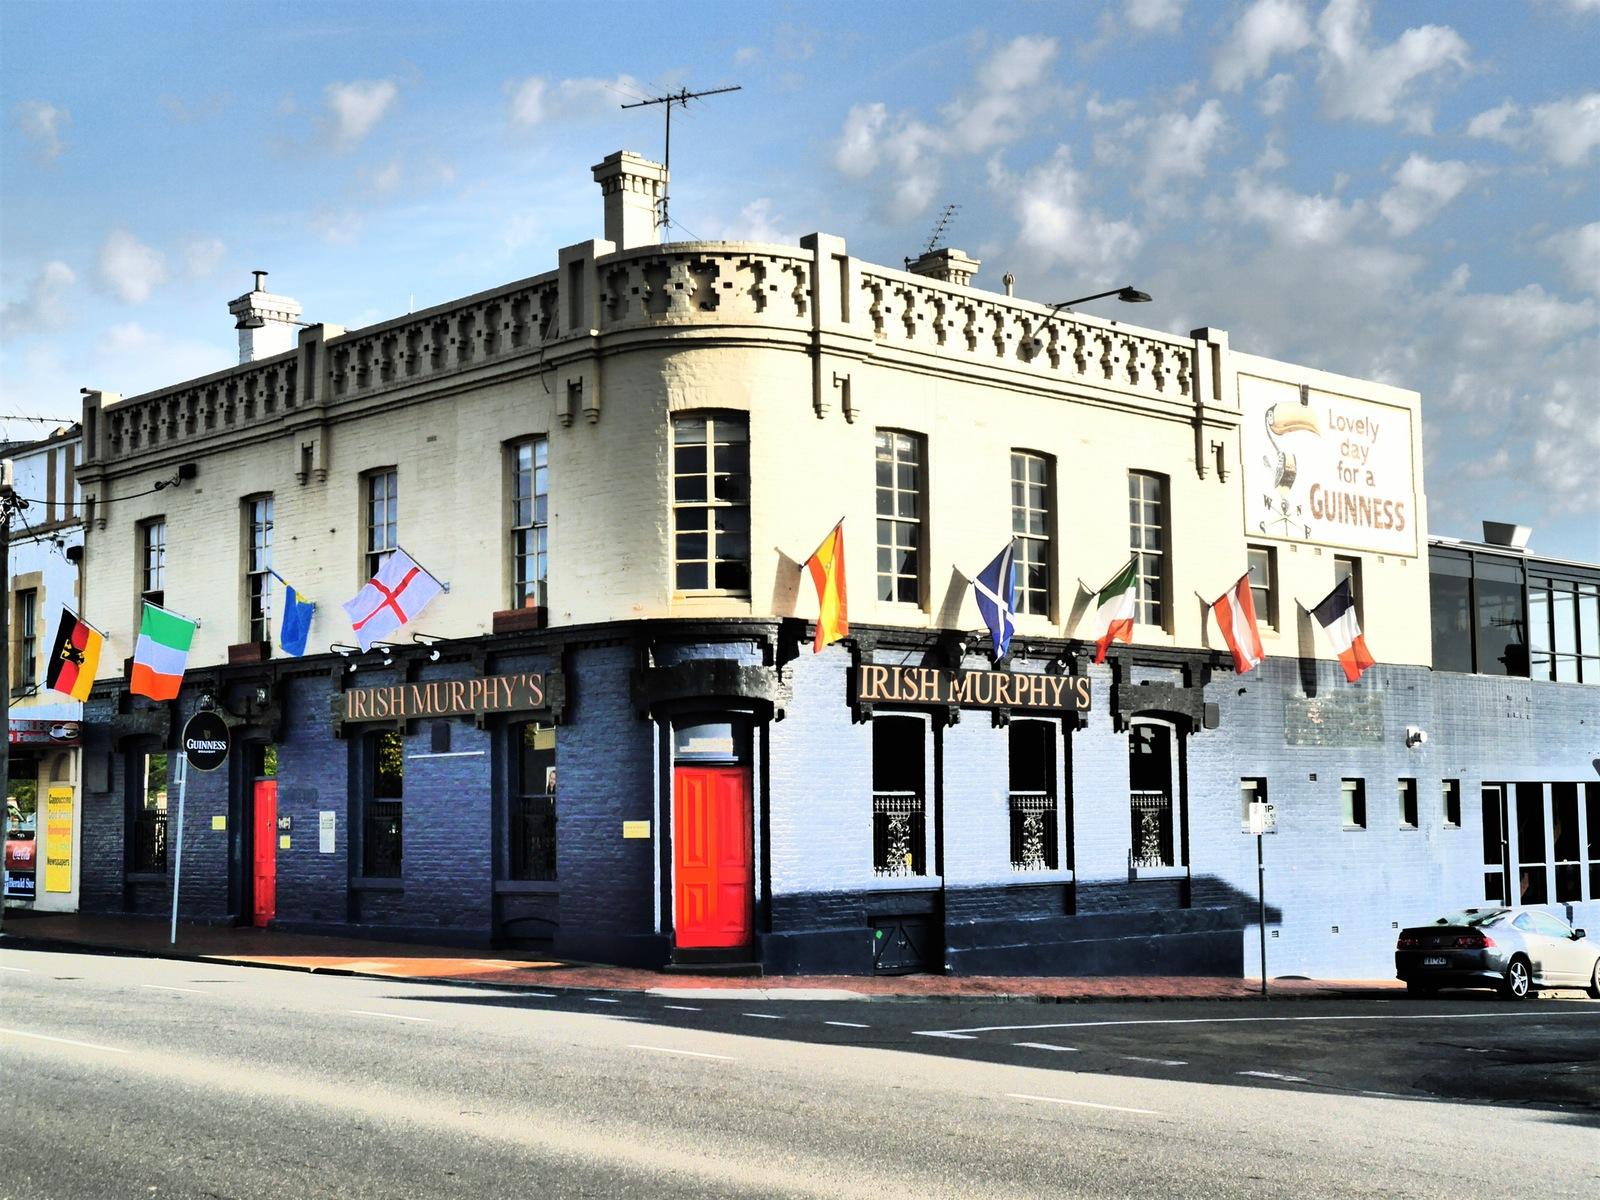 Irish Murphy's Building